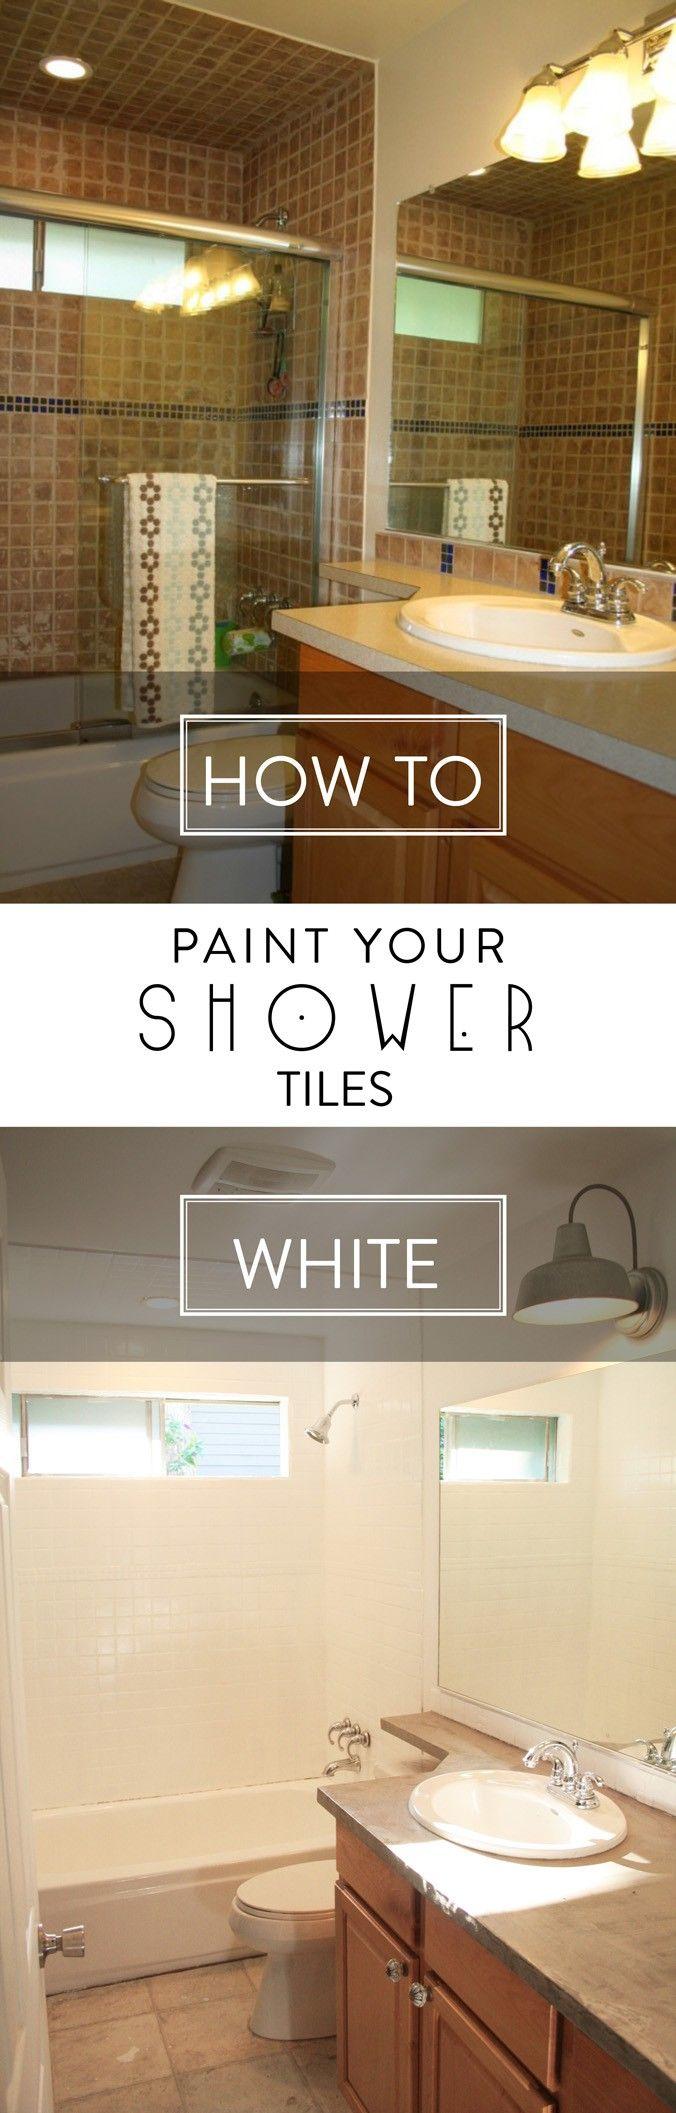 Best 25 paint bathroom tiles ideas on pinterest painting how to paint shower tiles white doublecrazyfo Gallery